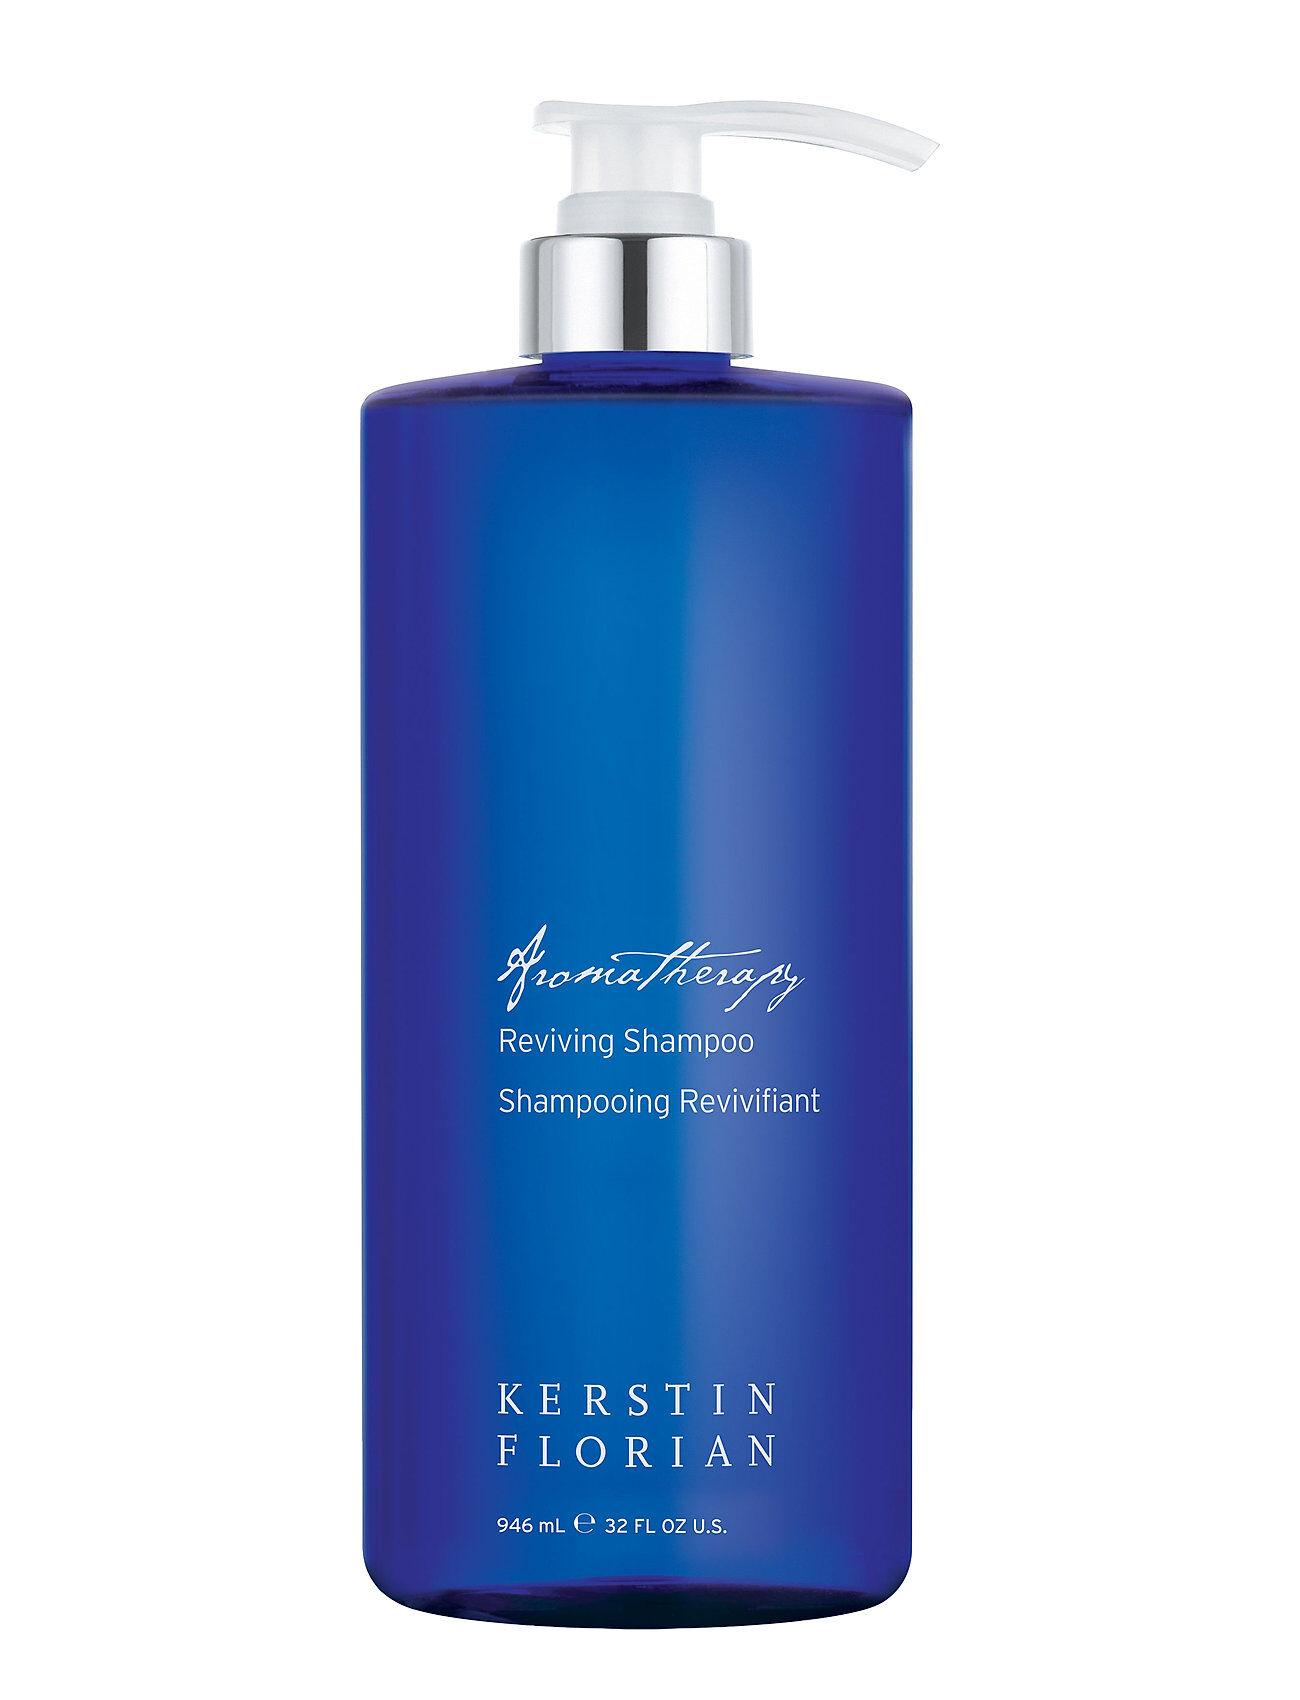 Kerstin Florian Reviving Shampoo